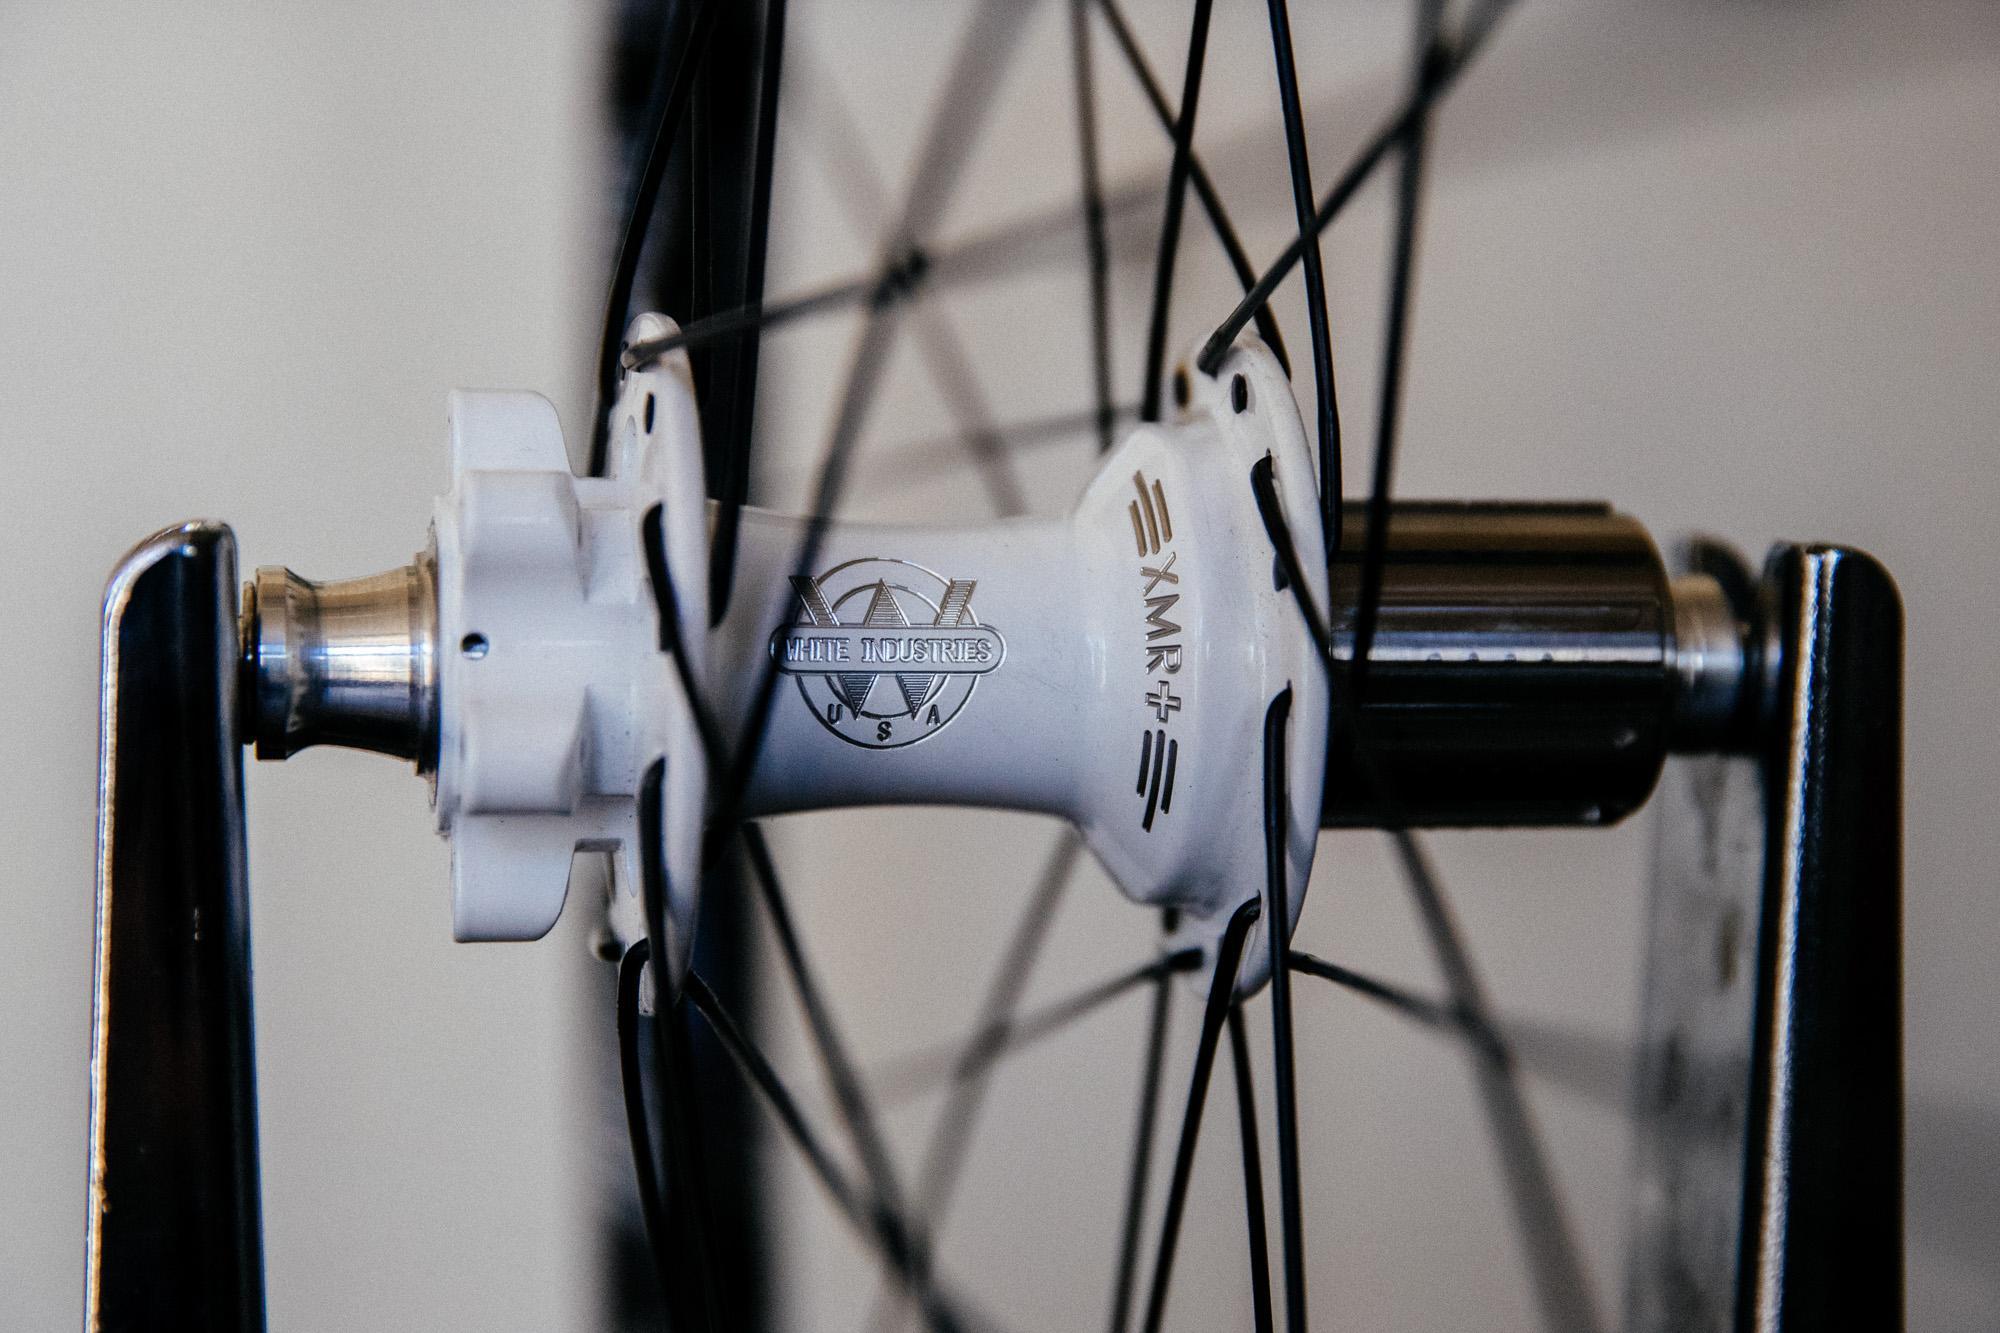 White hub - get it?